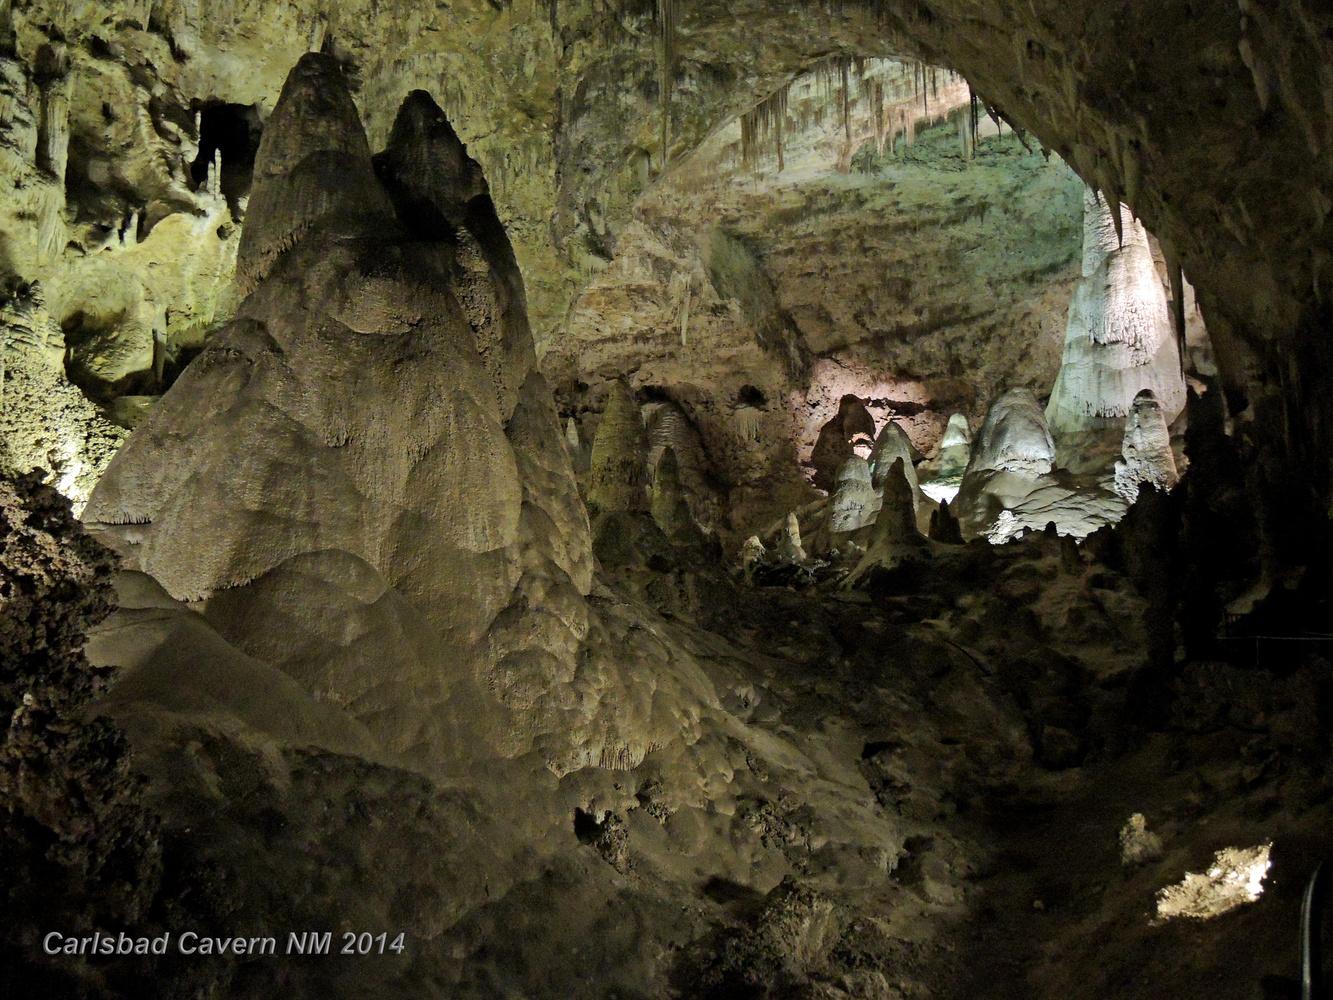 Carlsbad Cavern, New Mexico by Charles Haacker